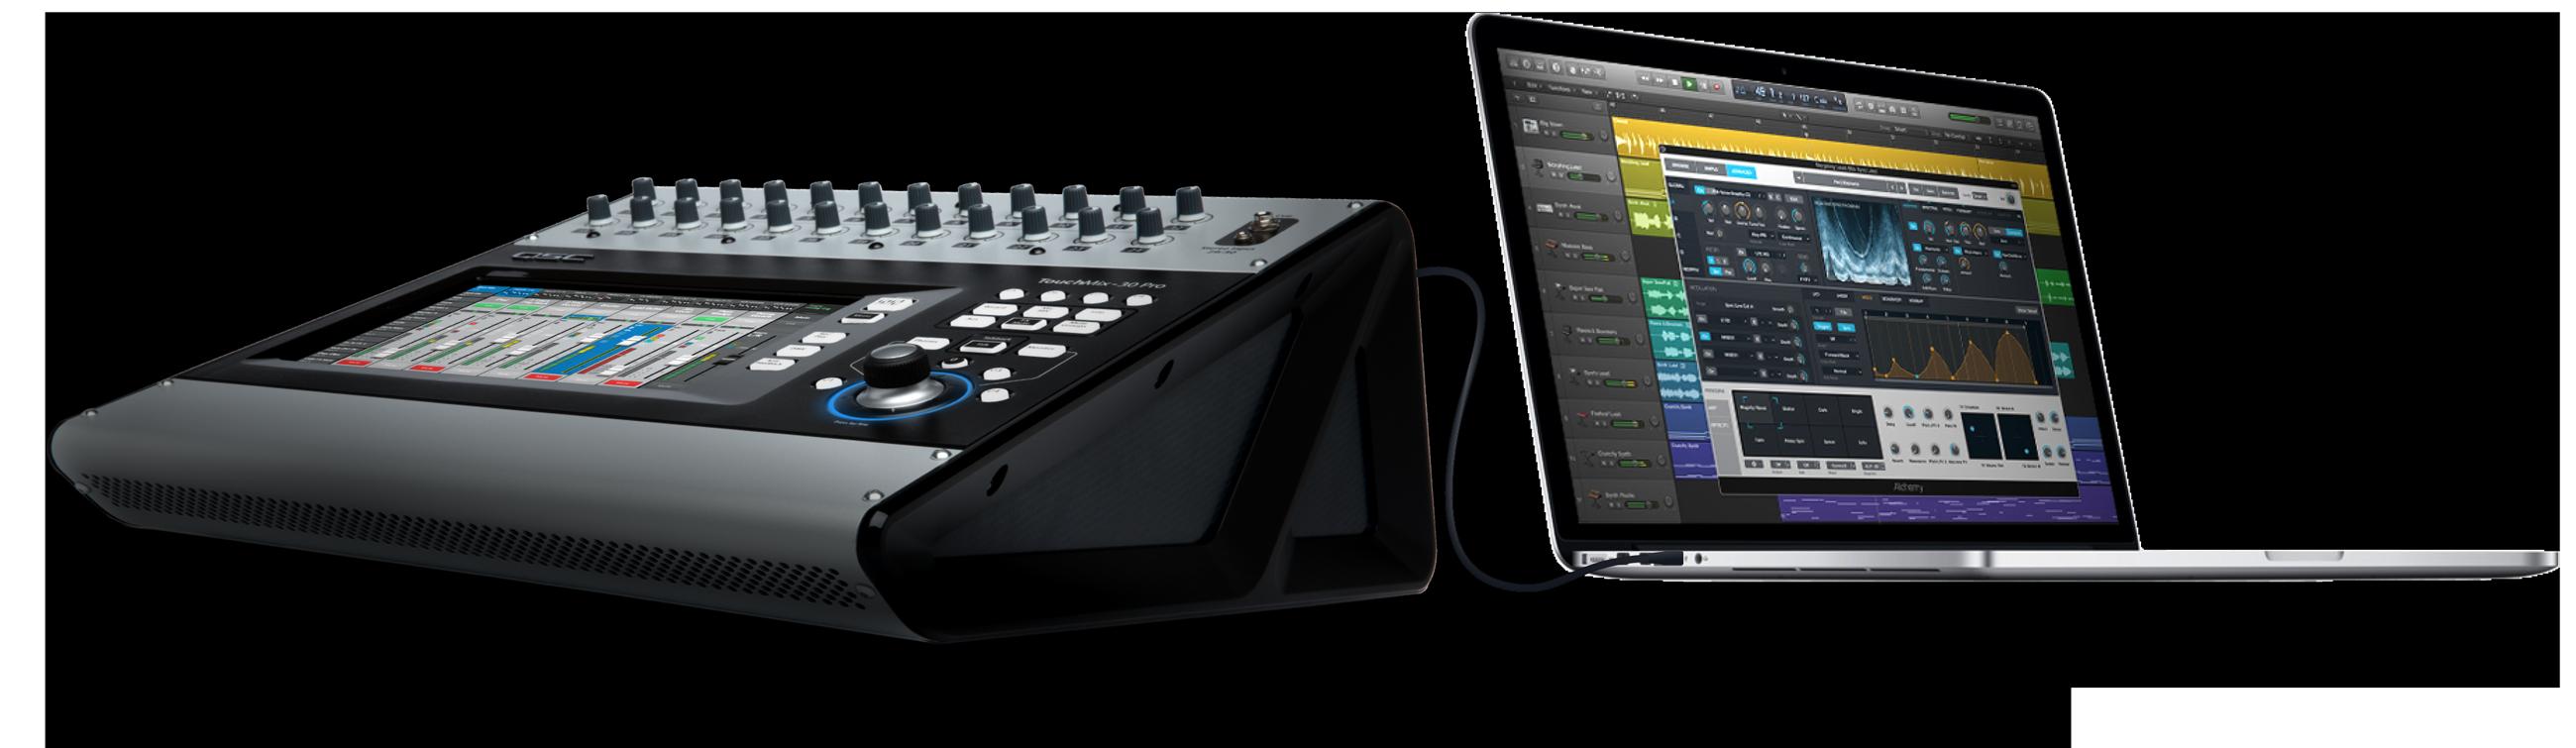 touchmix 30 pro 32 channel digital mixer. Black Bedroom Furniture Sets. Home Design Ideas